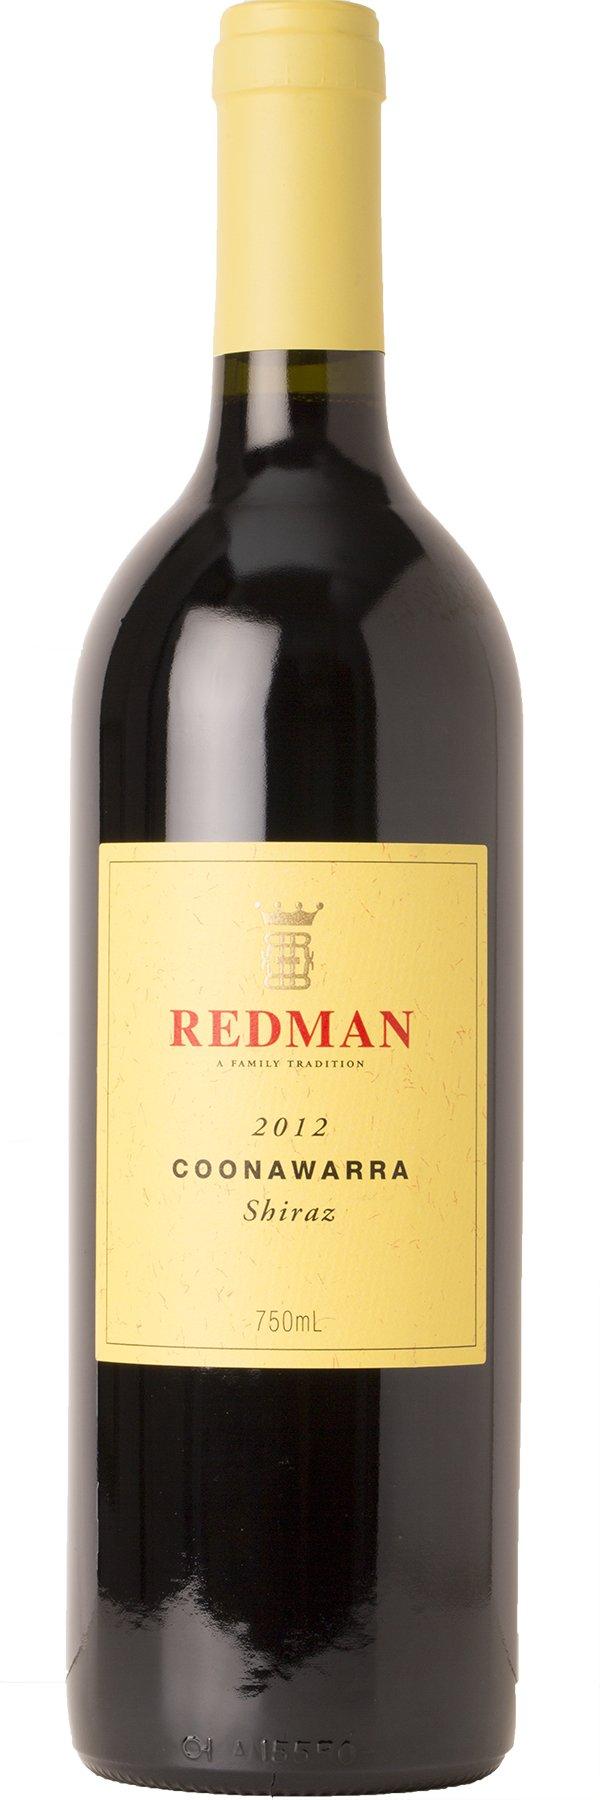 Redman Shiraz 2012-0